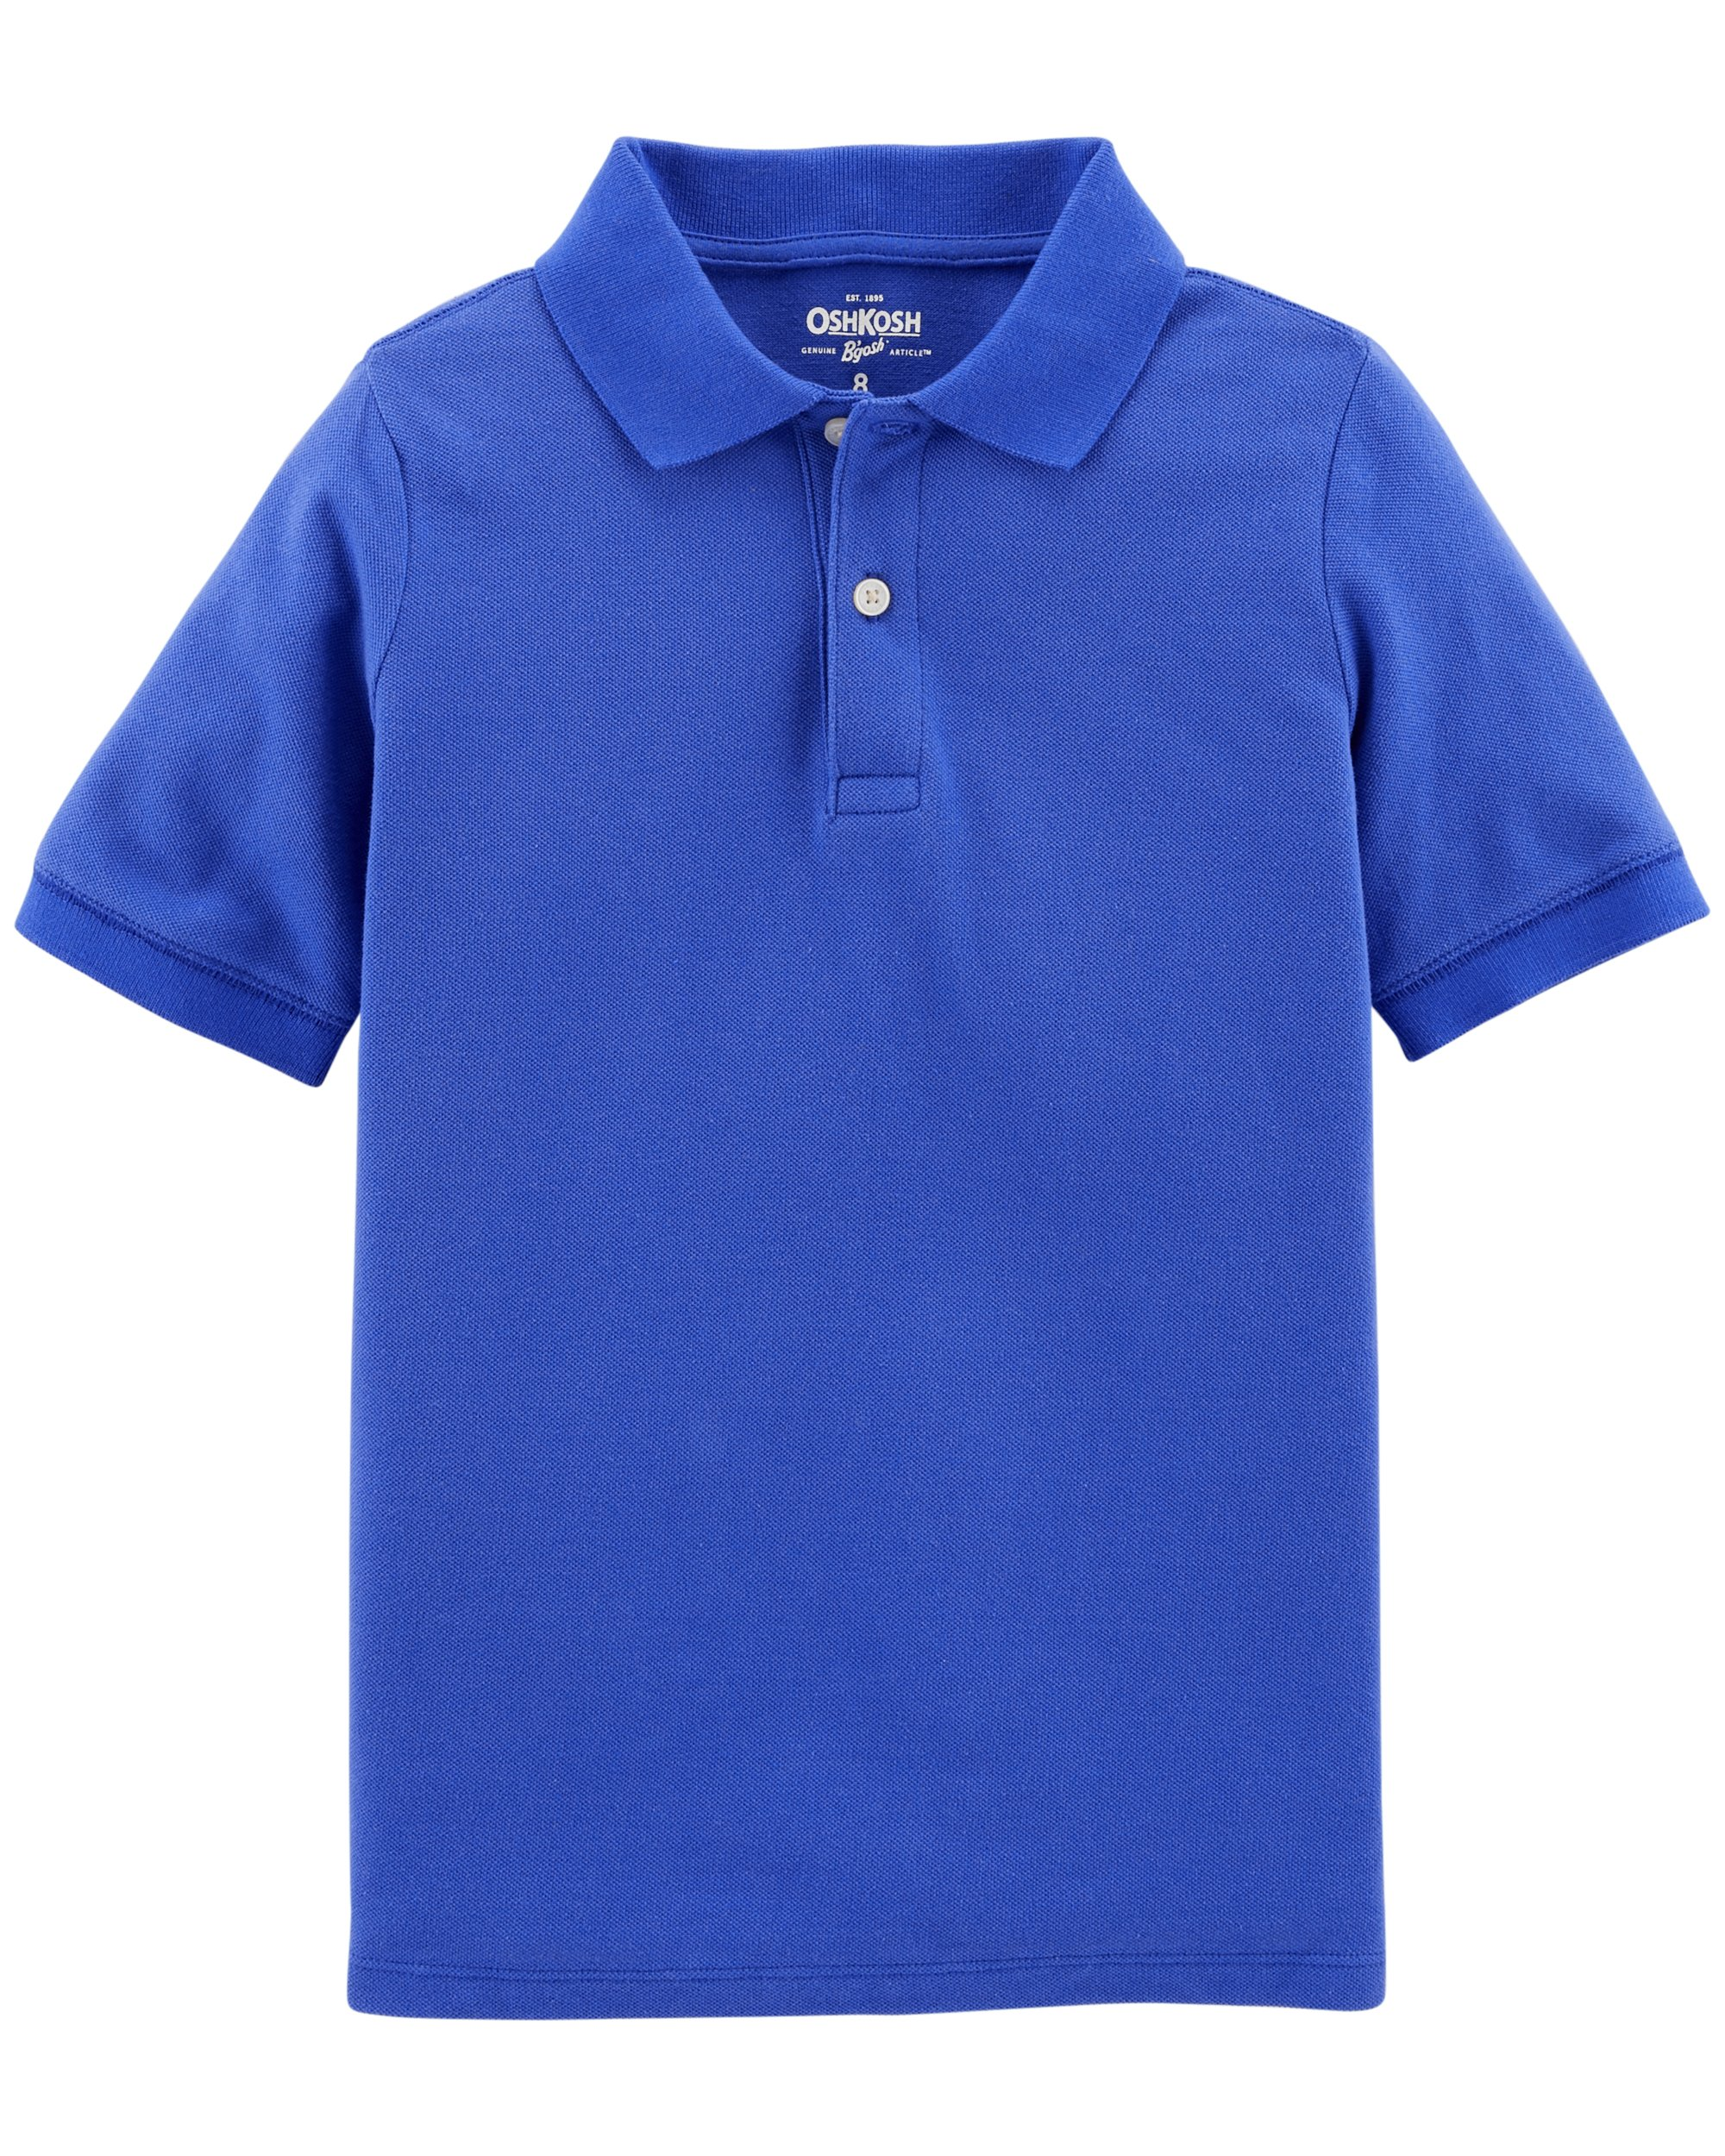 Osh Kosh Boys' Short Sleeve Uniform Polo, Royal Blue, 8